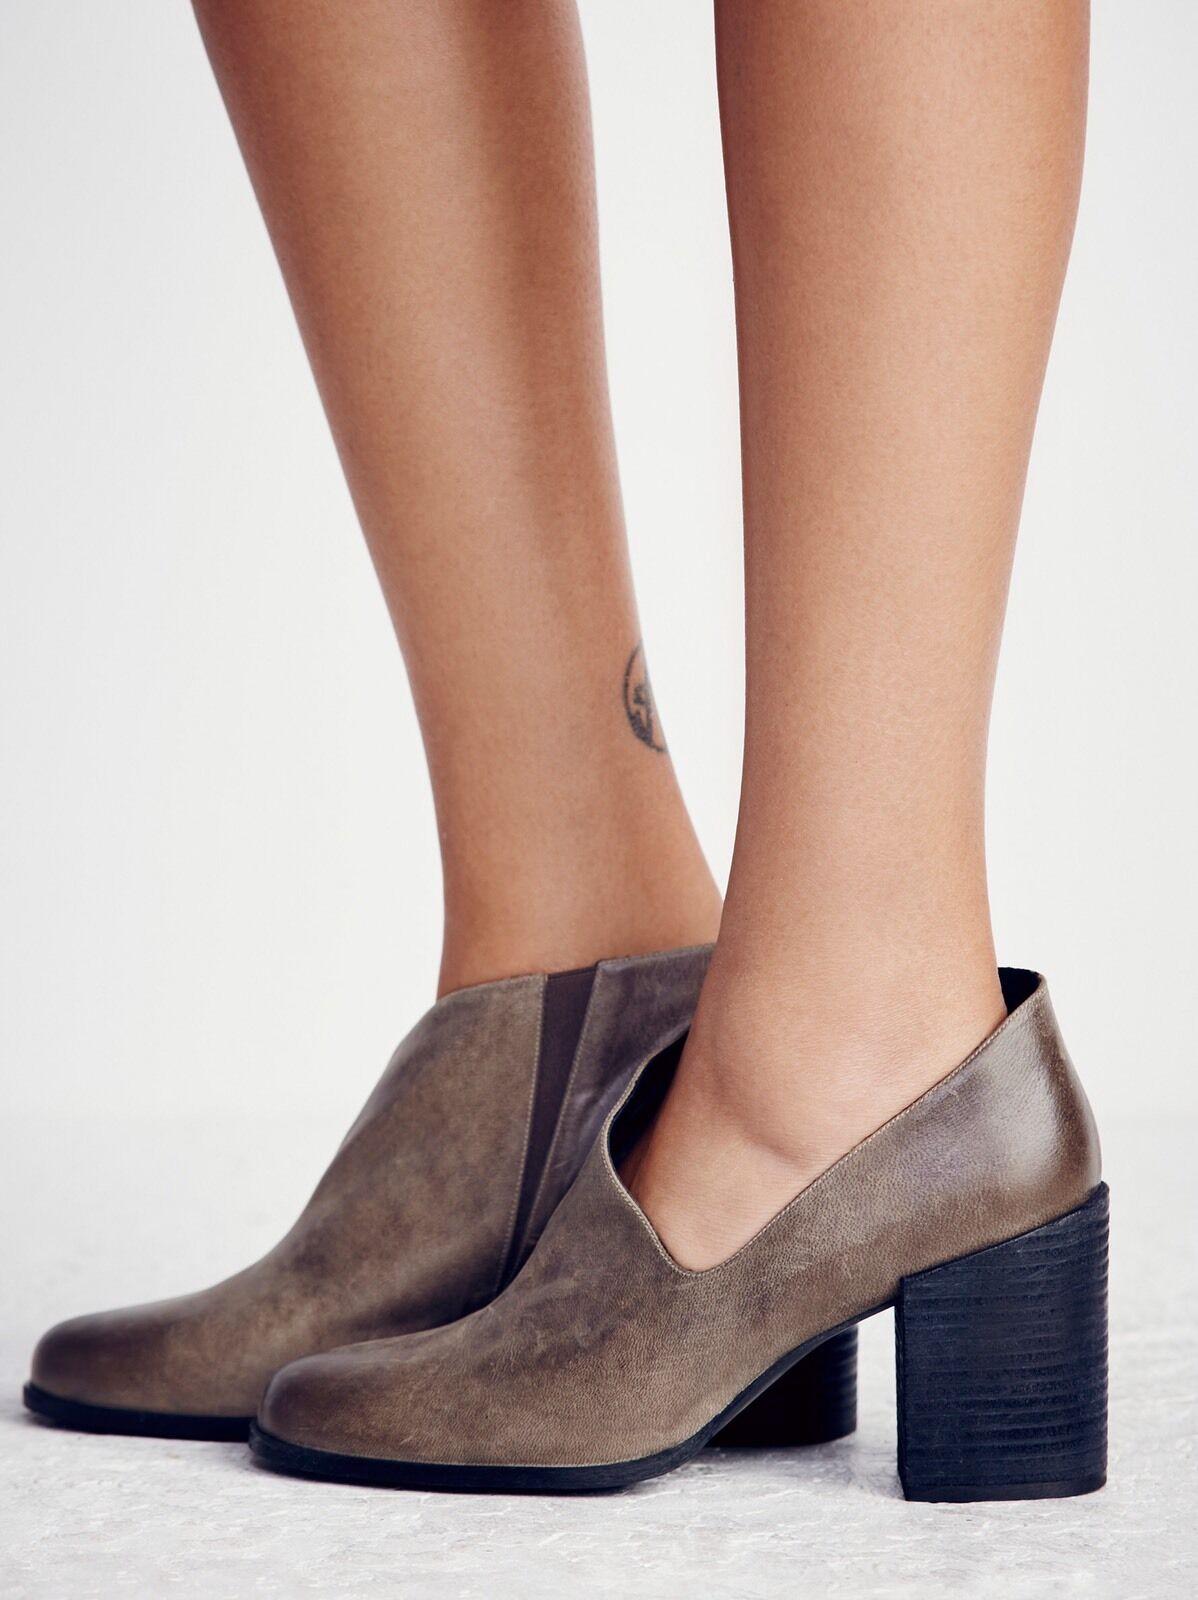 Free People Terrah Heel Boot Size 7 Pelle New MSRP:  198